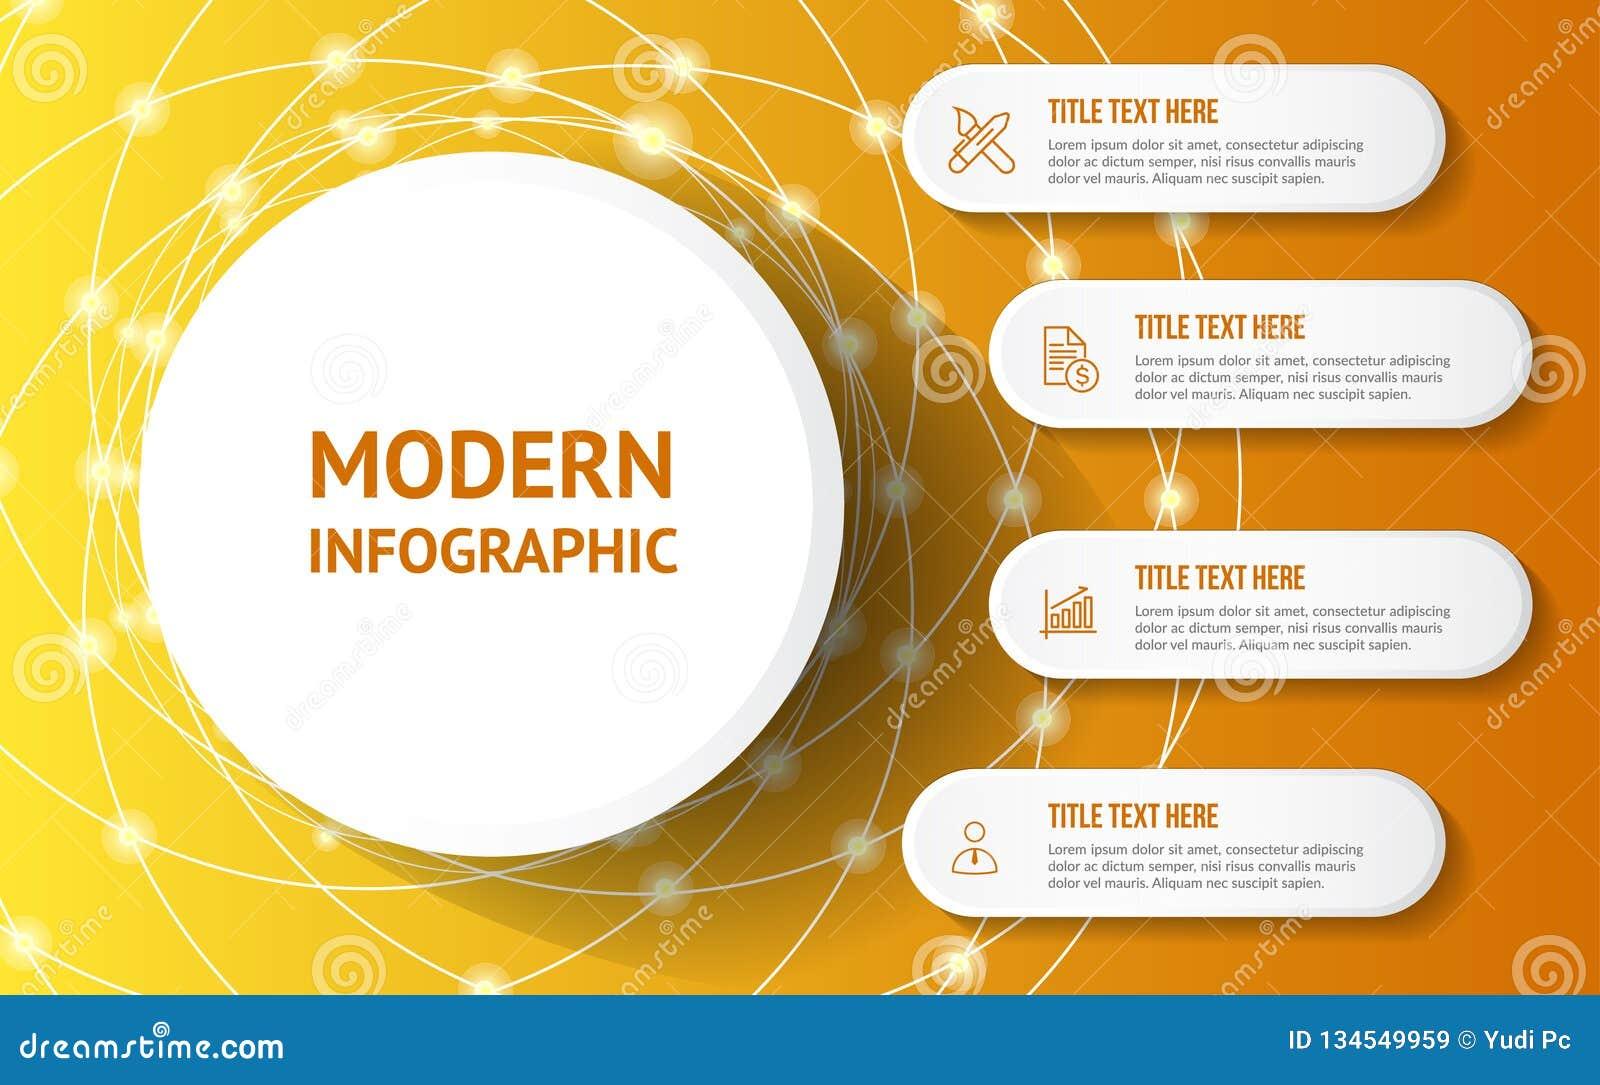 Modernt infographic med gul bakgrund